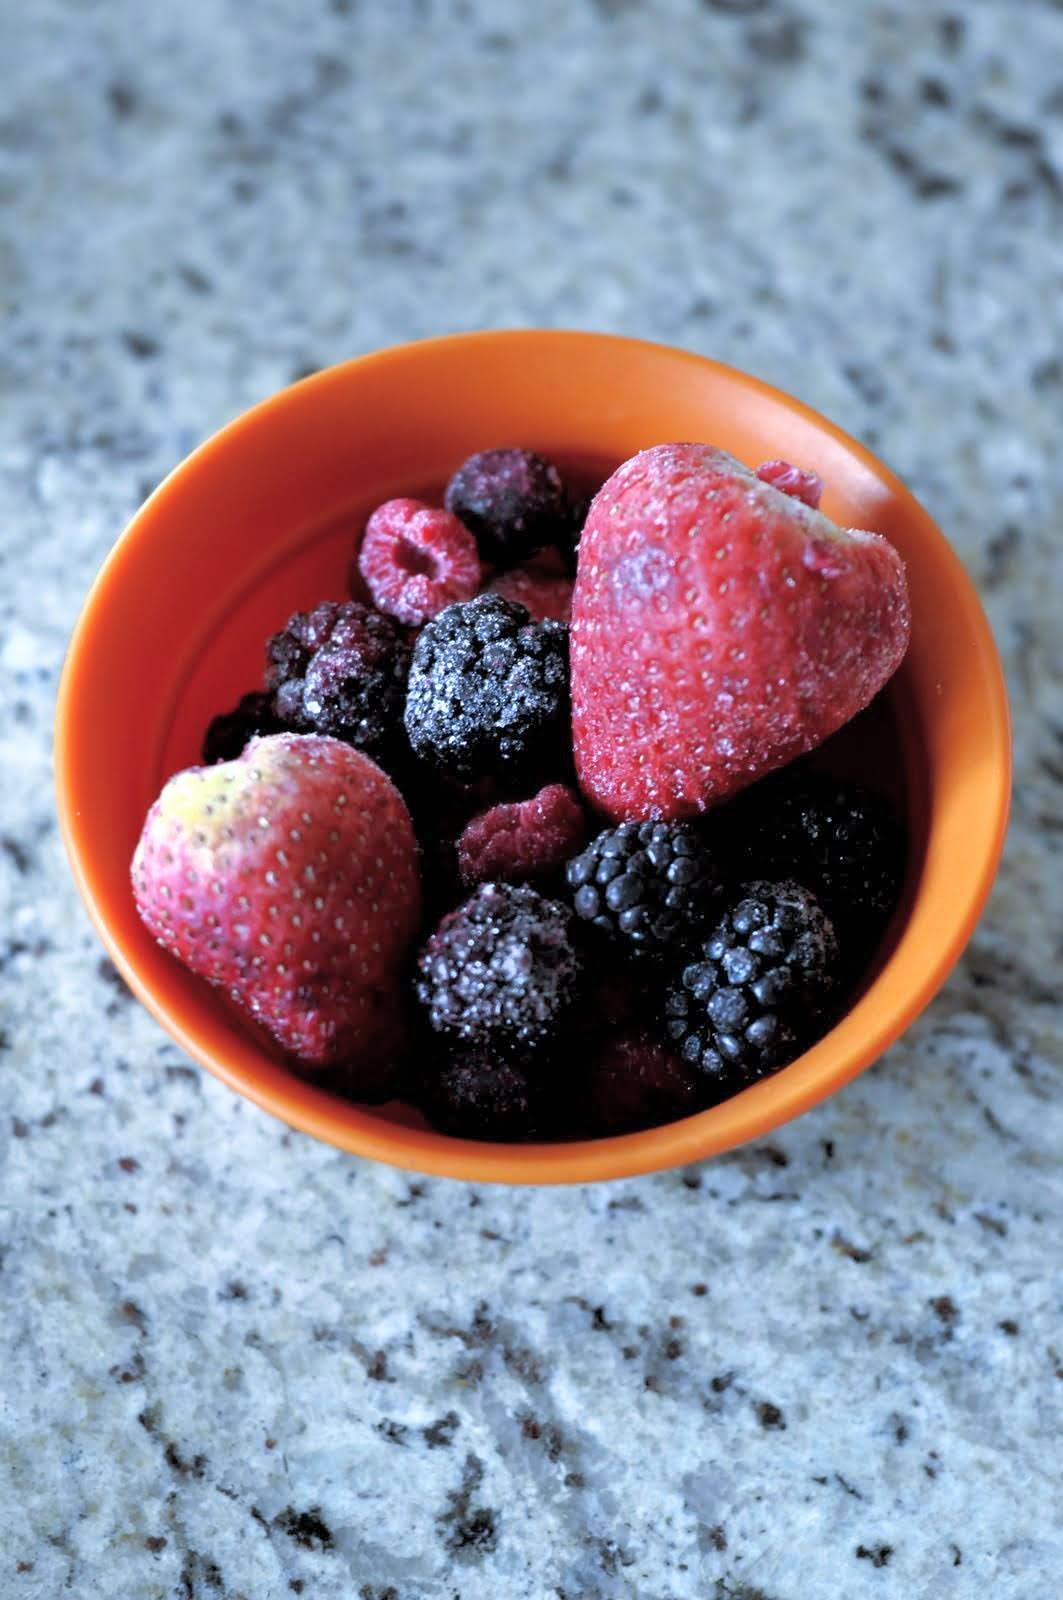 Measuring cup containing a mixture of frozen berries -- strawberries, raspberries, blackberries, and blueberries.